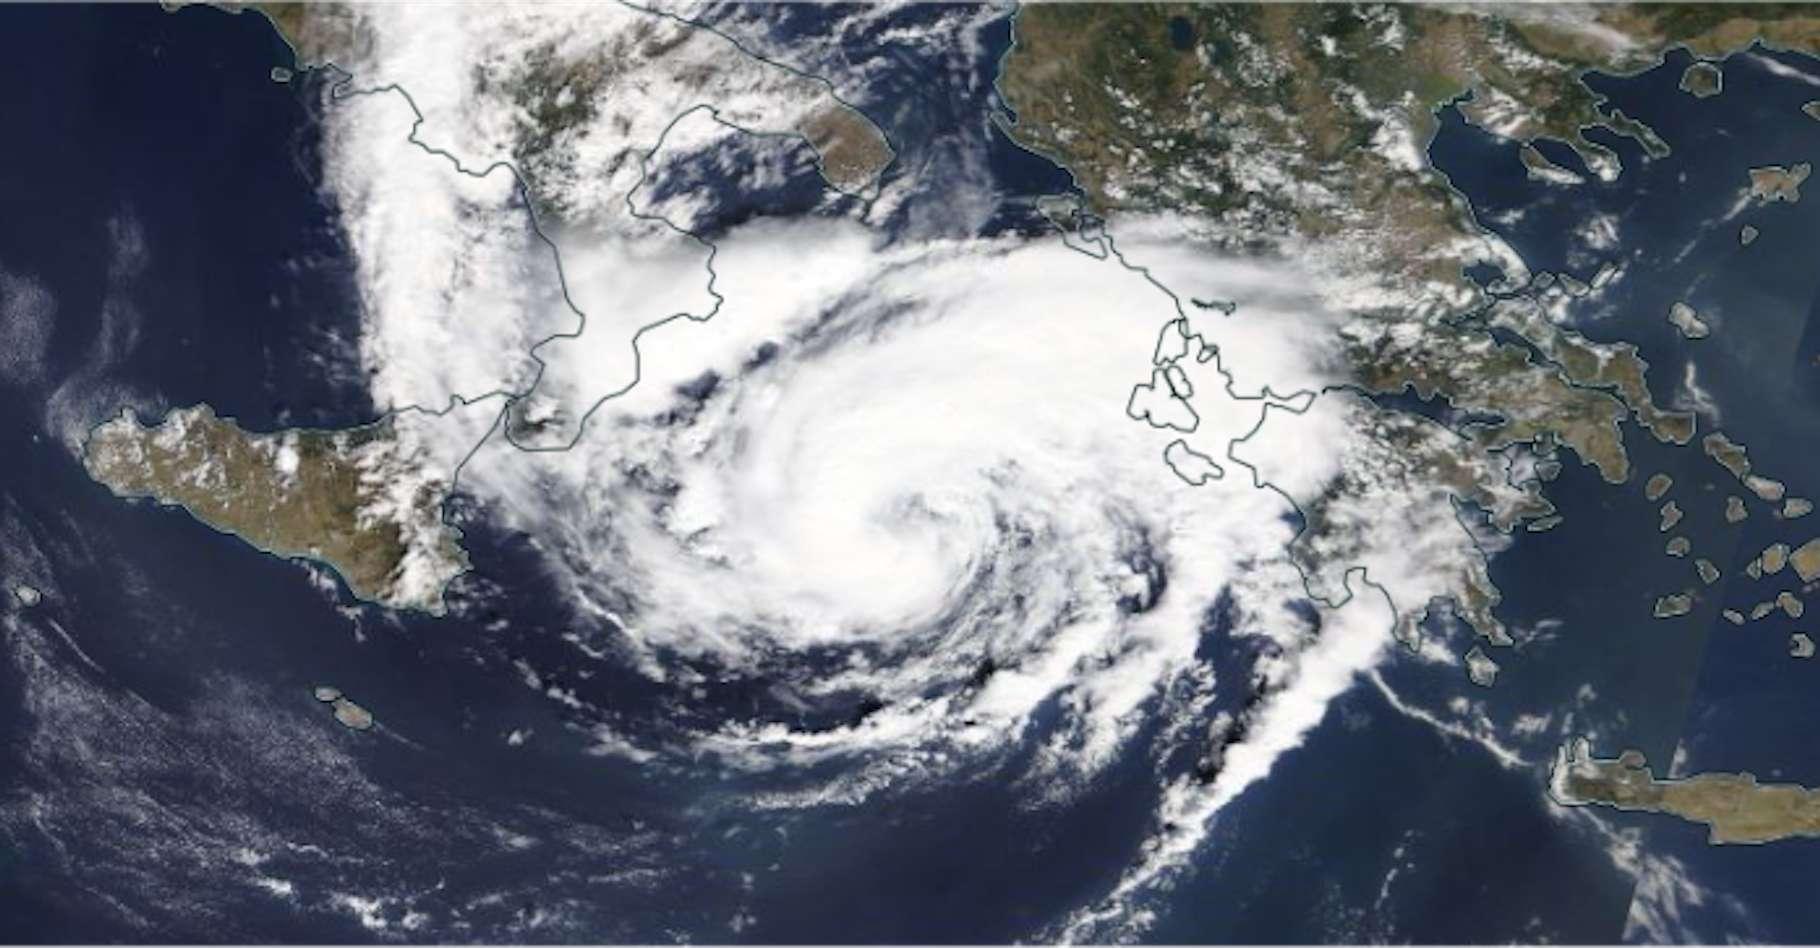 Le medicane Ianos tel que vu par un satellite de la Nasa ce jeudi 17 septembre au matin. © Modis, Terra, Nasa